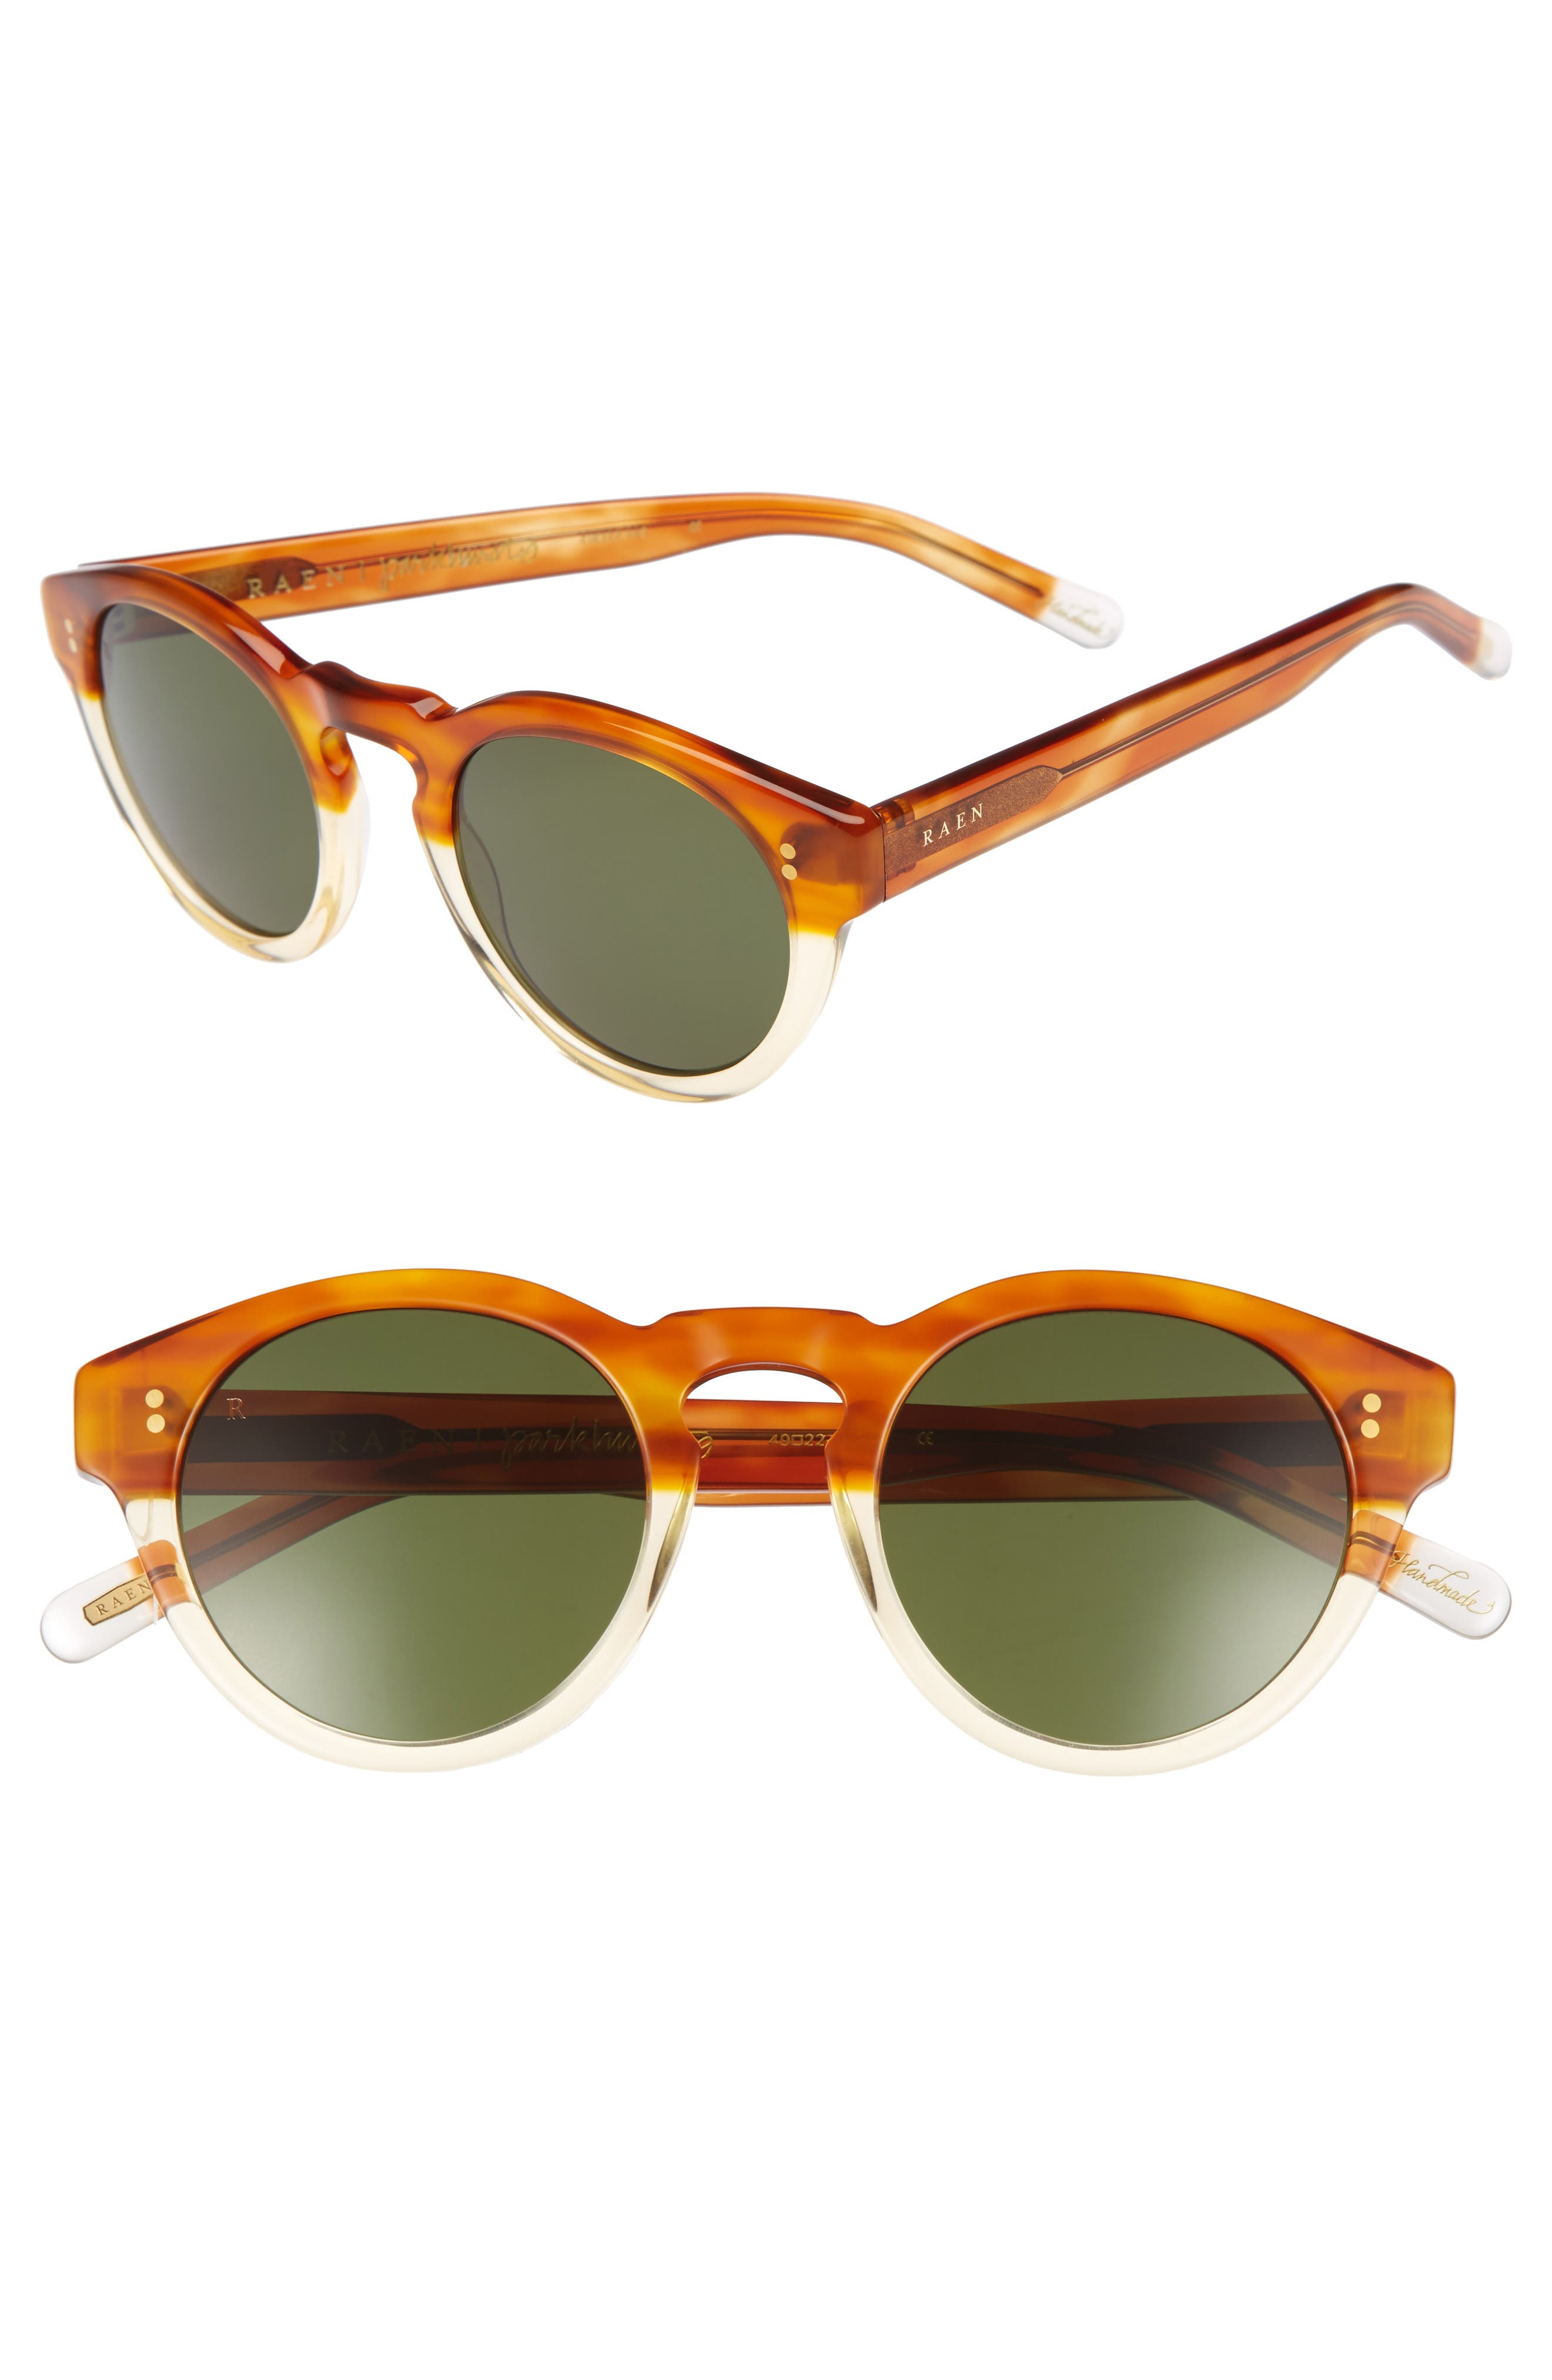 Parkhurst 49mm Sunglasses,                         Main,                         color, Honey Havana/ Green